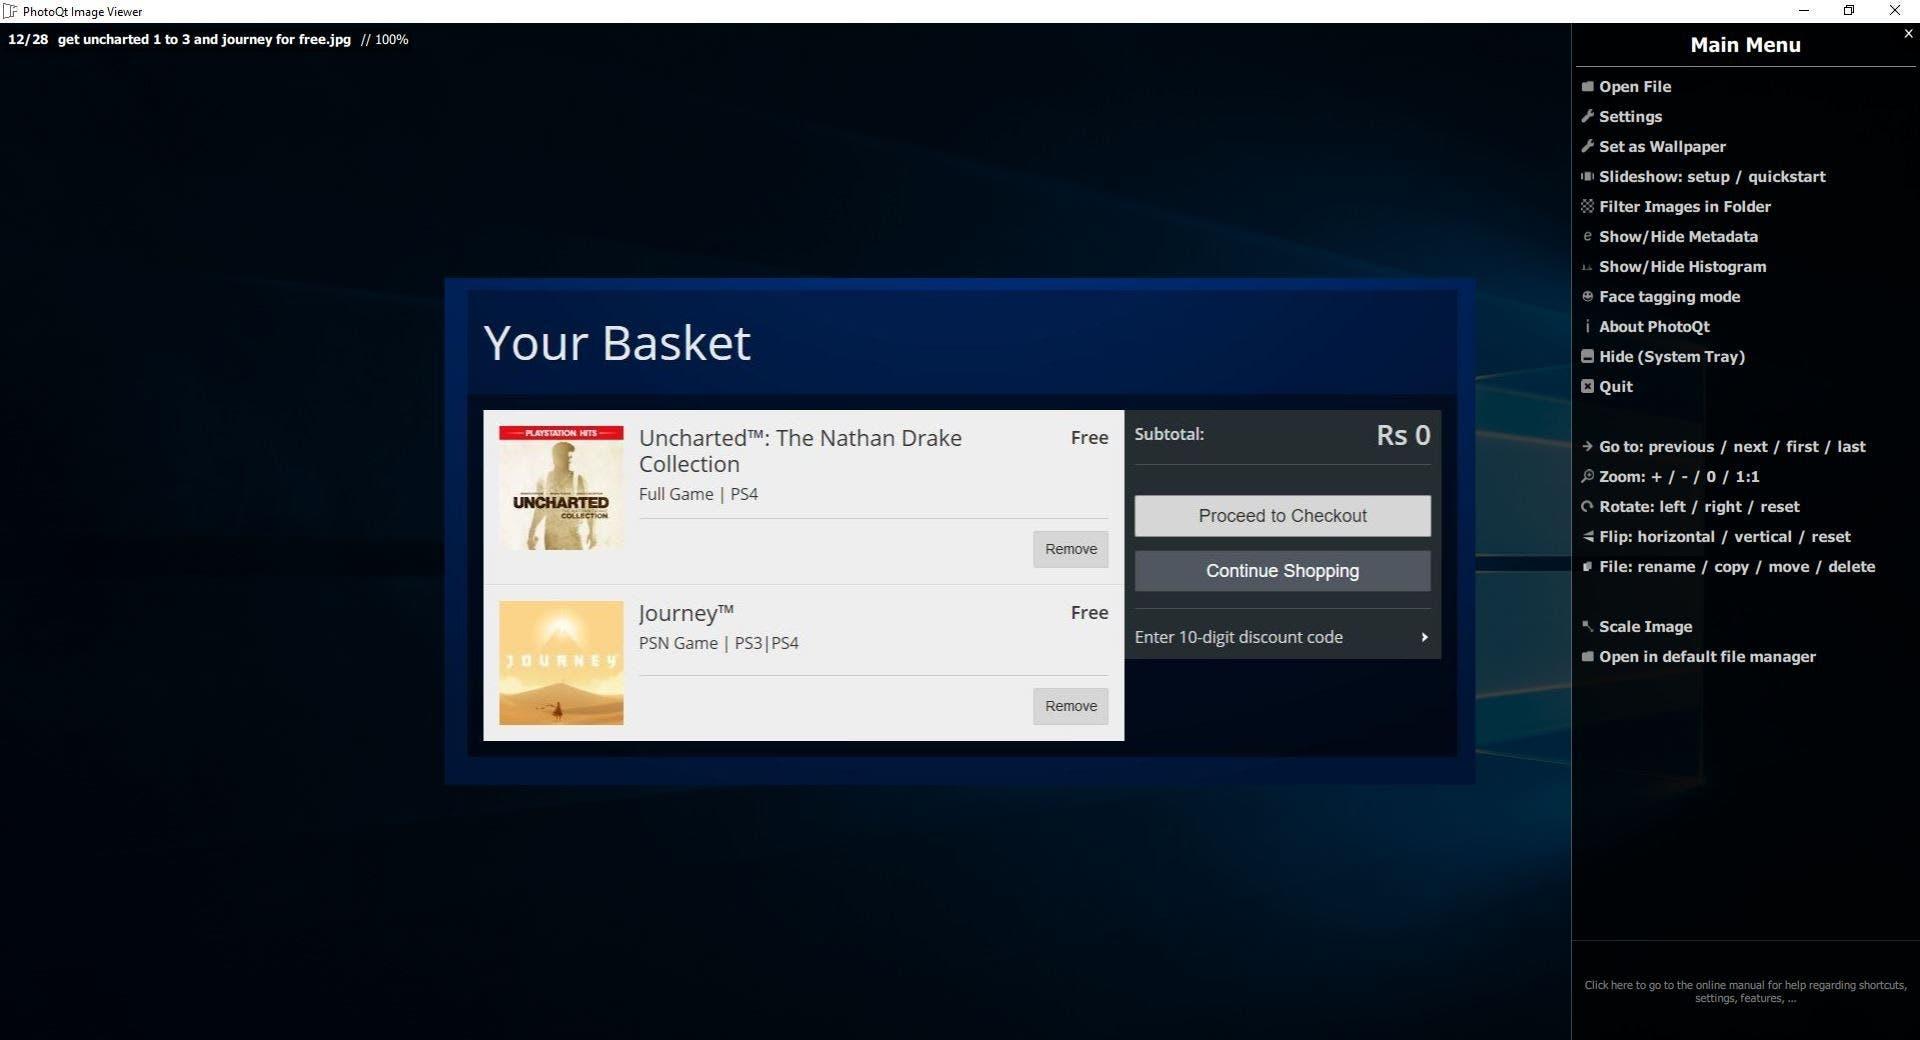 PhotoQt settings menu